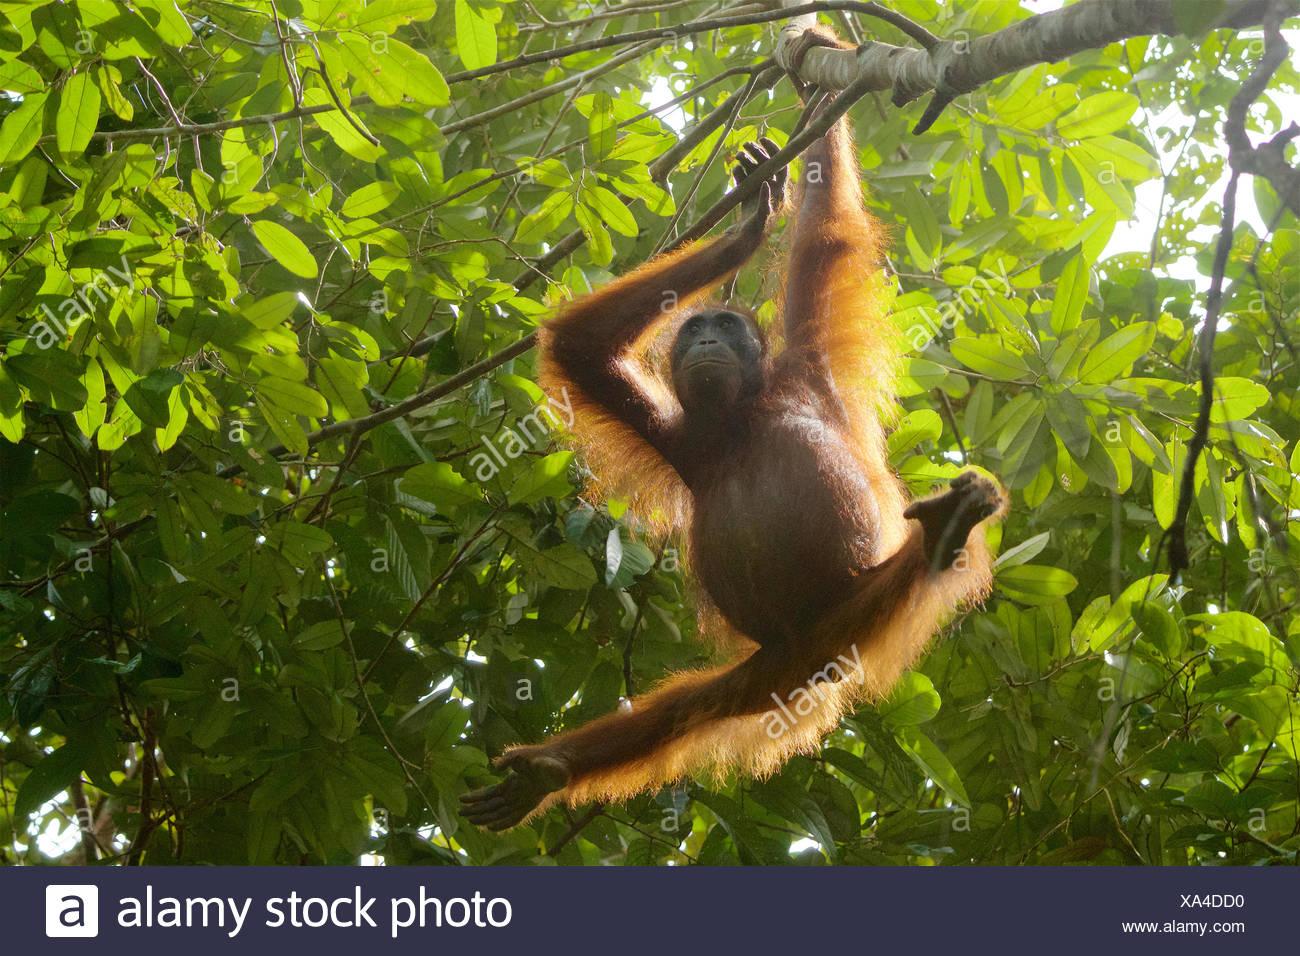 An adult female orangutan, Pongo pygmaeus wurmbii, hangs from a tree in Gunung Palung National Park. - Stock Image